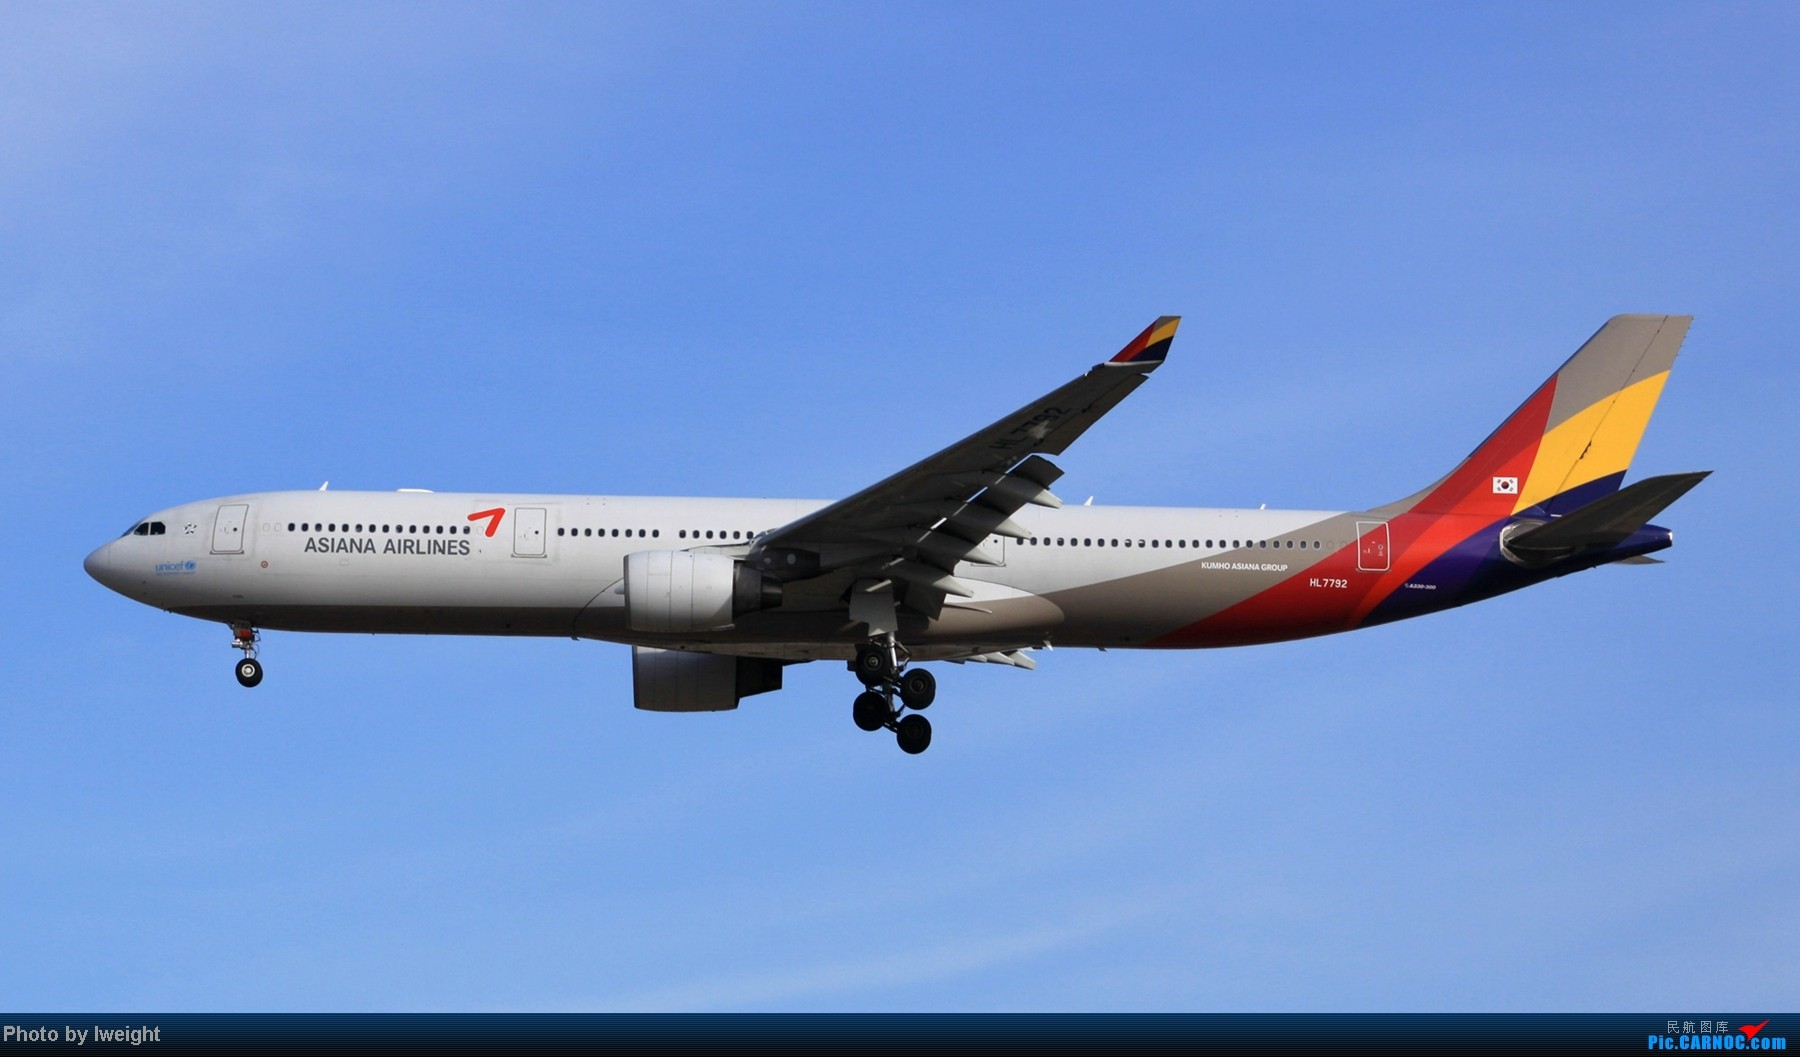 Re:[原创]春节期间首都机场拍机汇报 AIRBUS A330-300 HL7792 中国北京首都机场